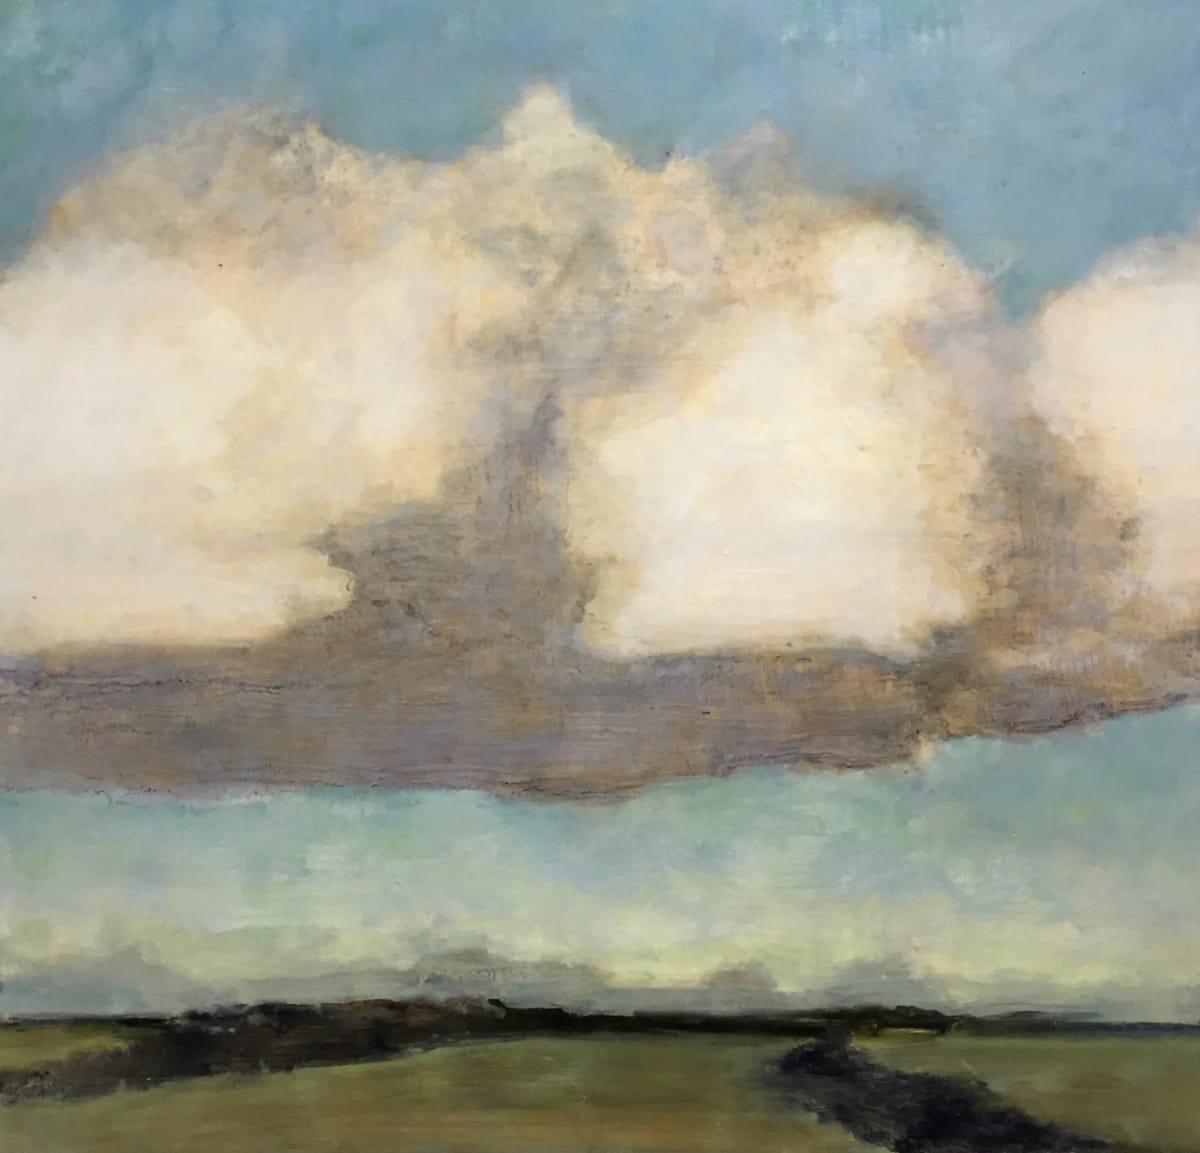 David Konigsberg, Lone Cumulus, 2018